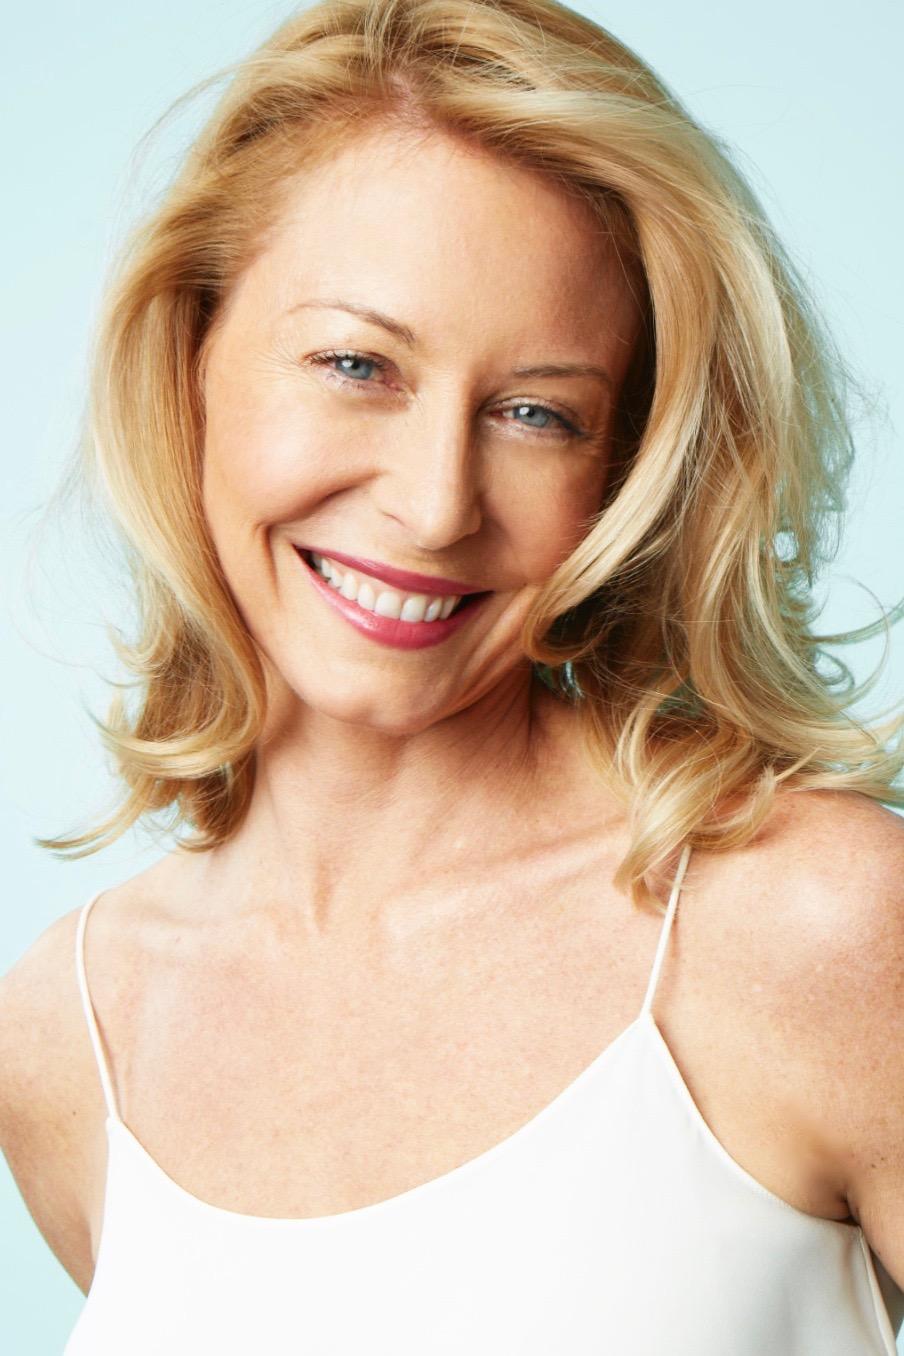 Gwen Gaydos - Holistic Wellness Coach, Reiki Master, Yoga & Meditation Teacher